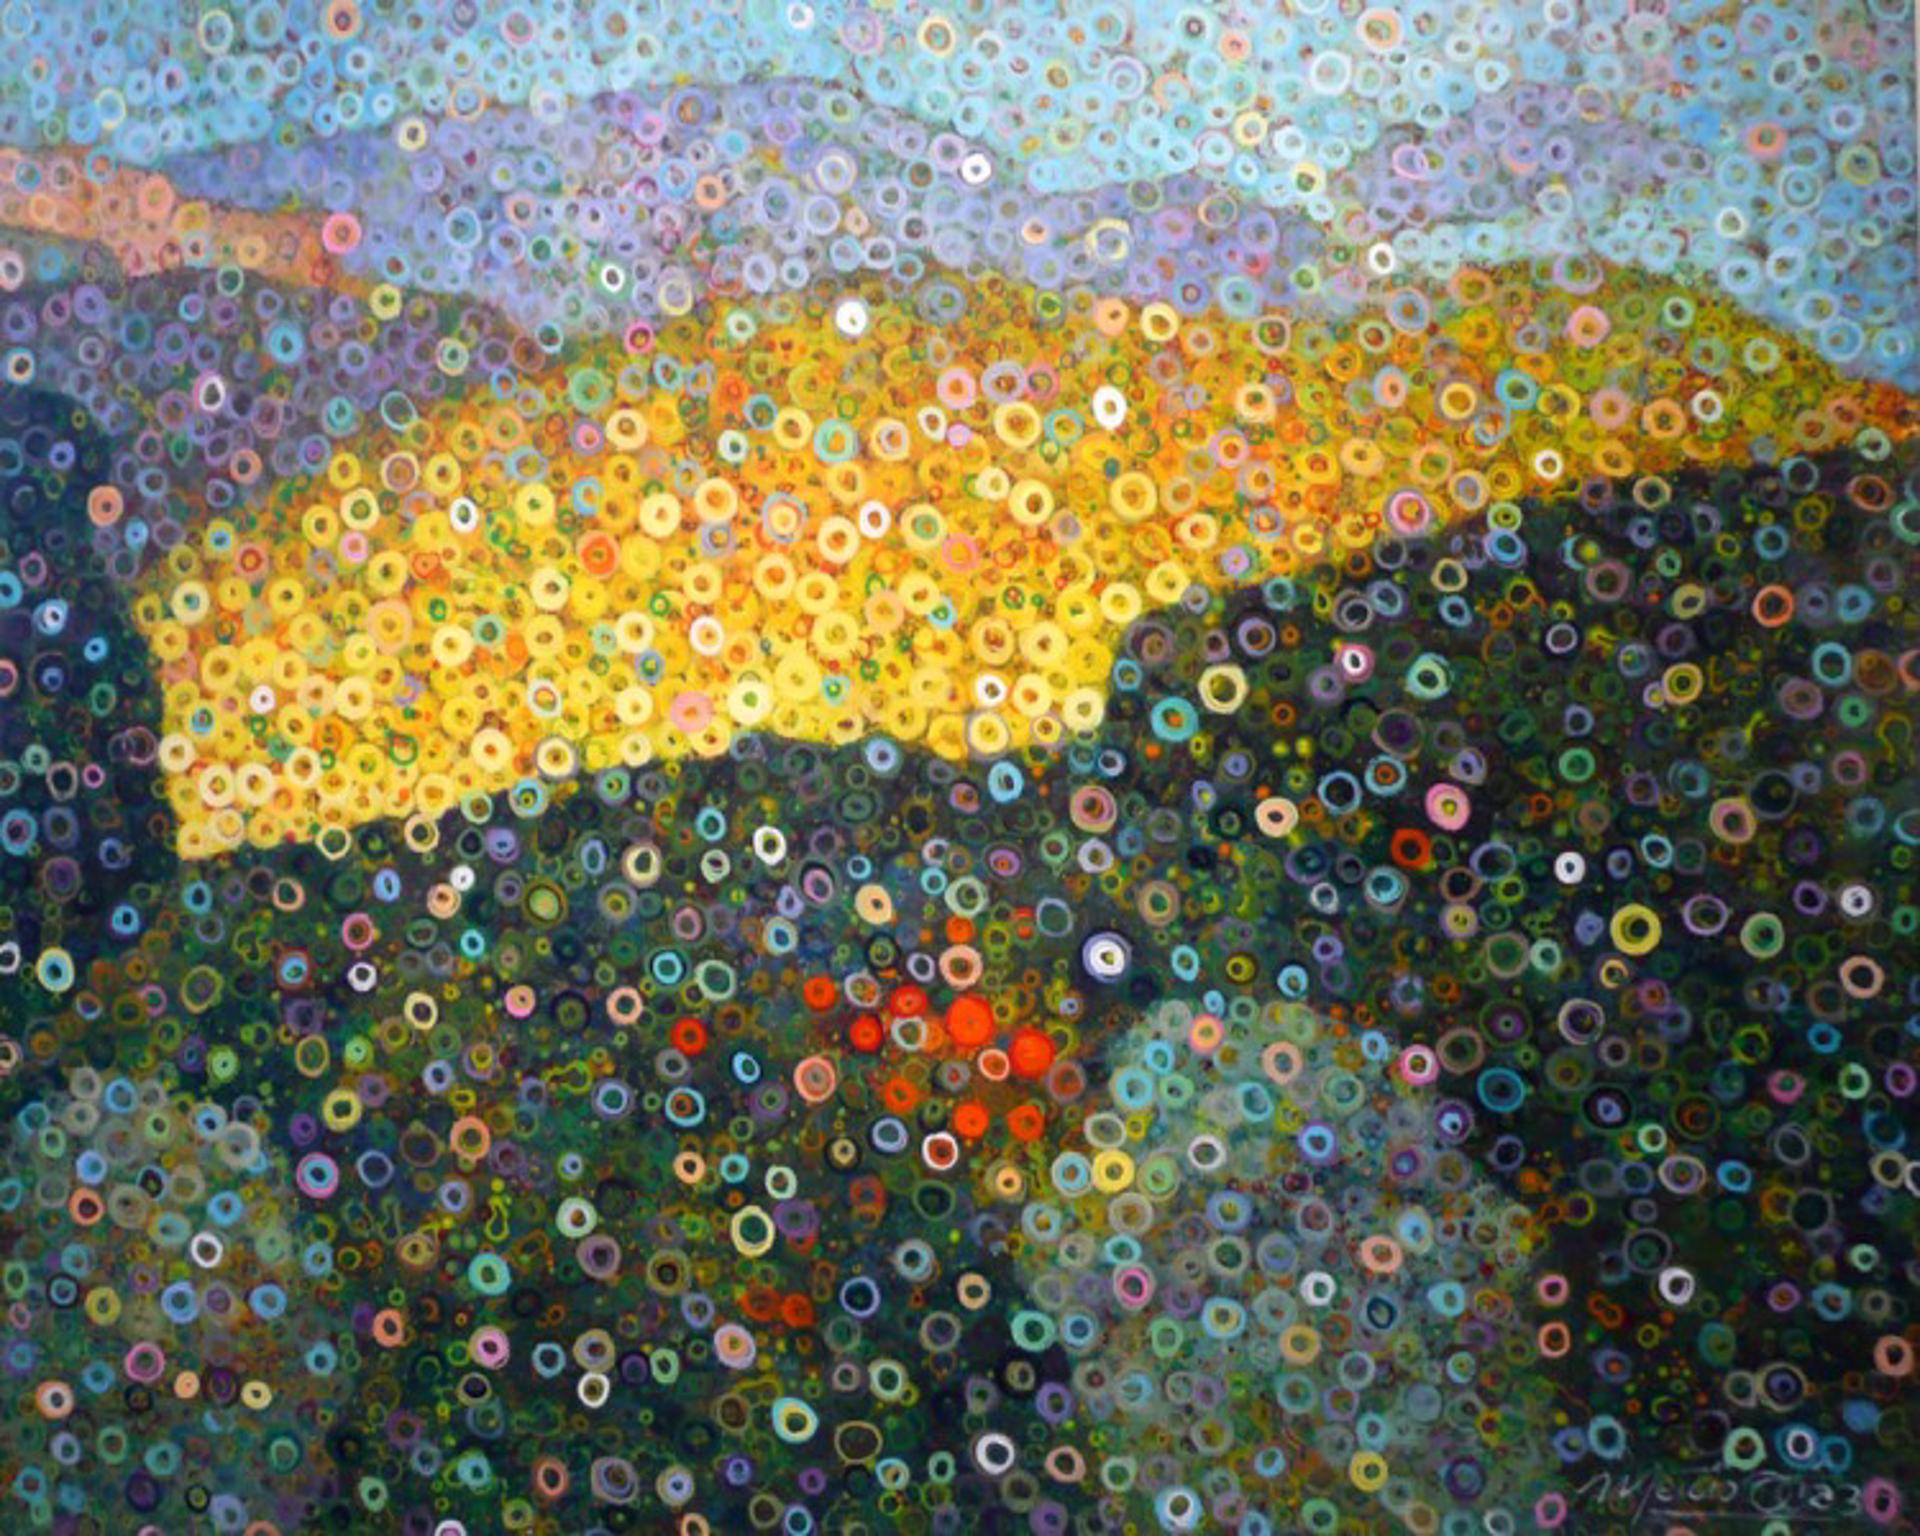 Twilight Over the Mountain by Marcio Diaz